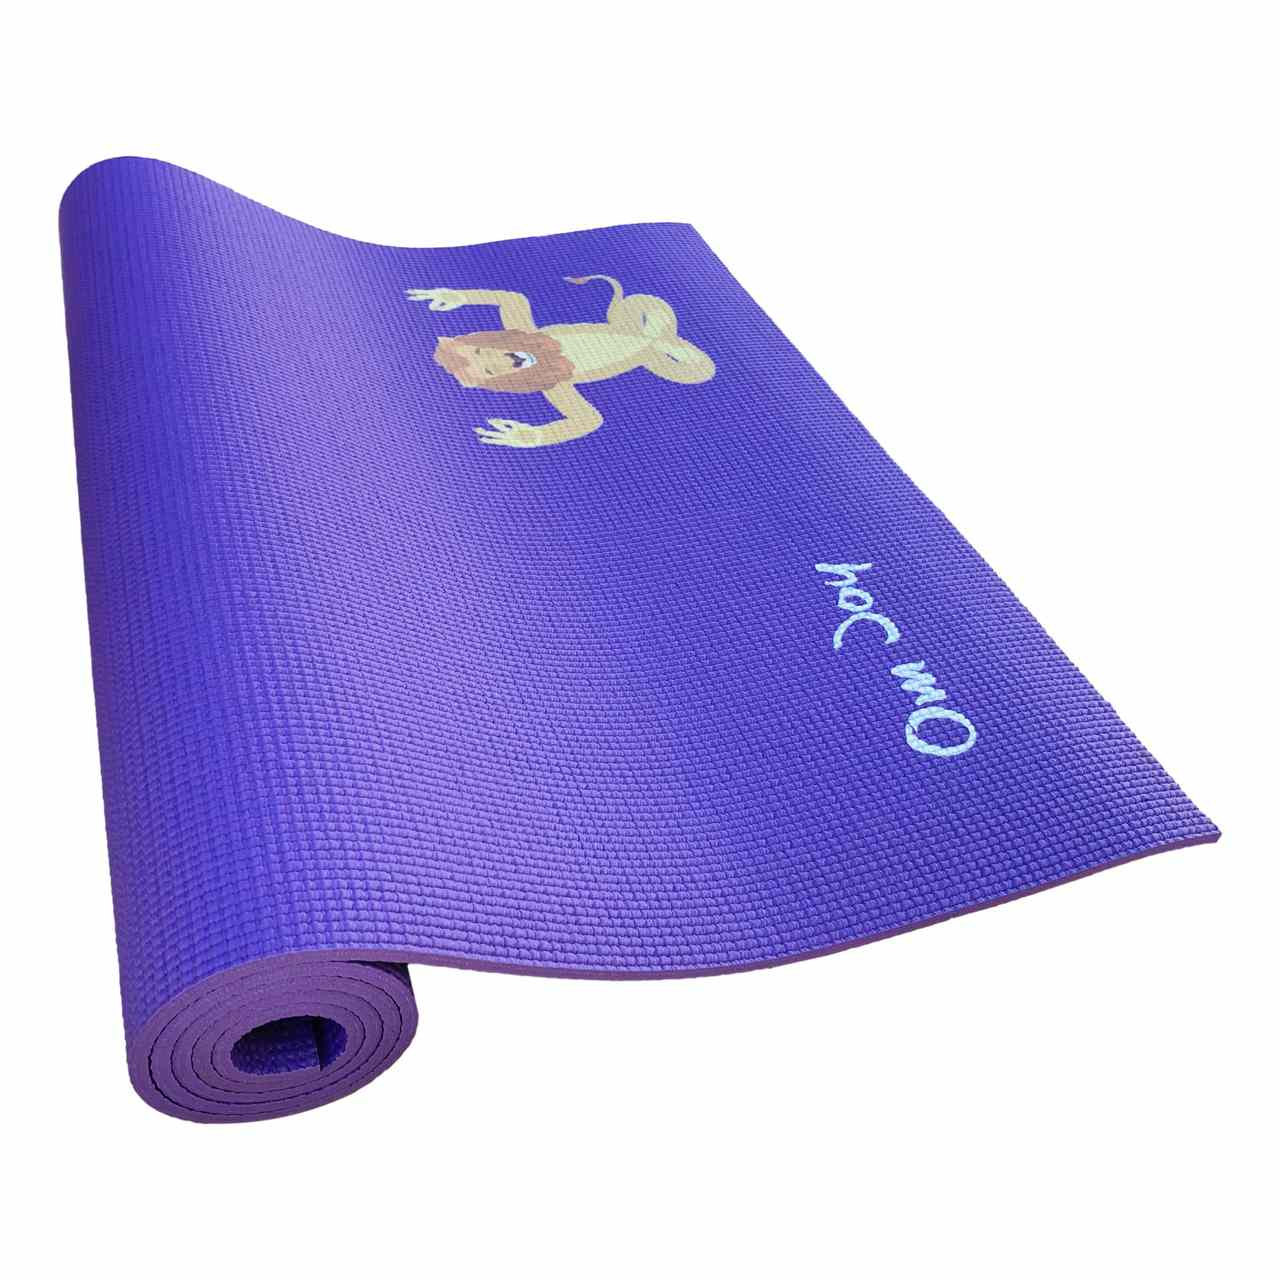 Tapete de Yoga Infantil PVC Estampado Kids - Juba, o Leão